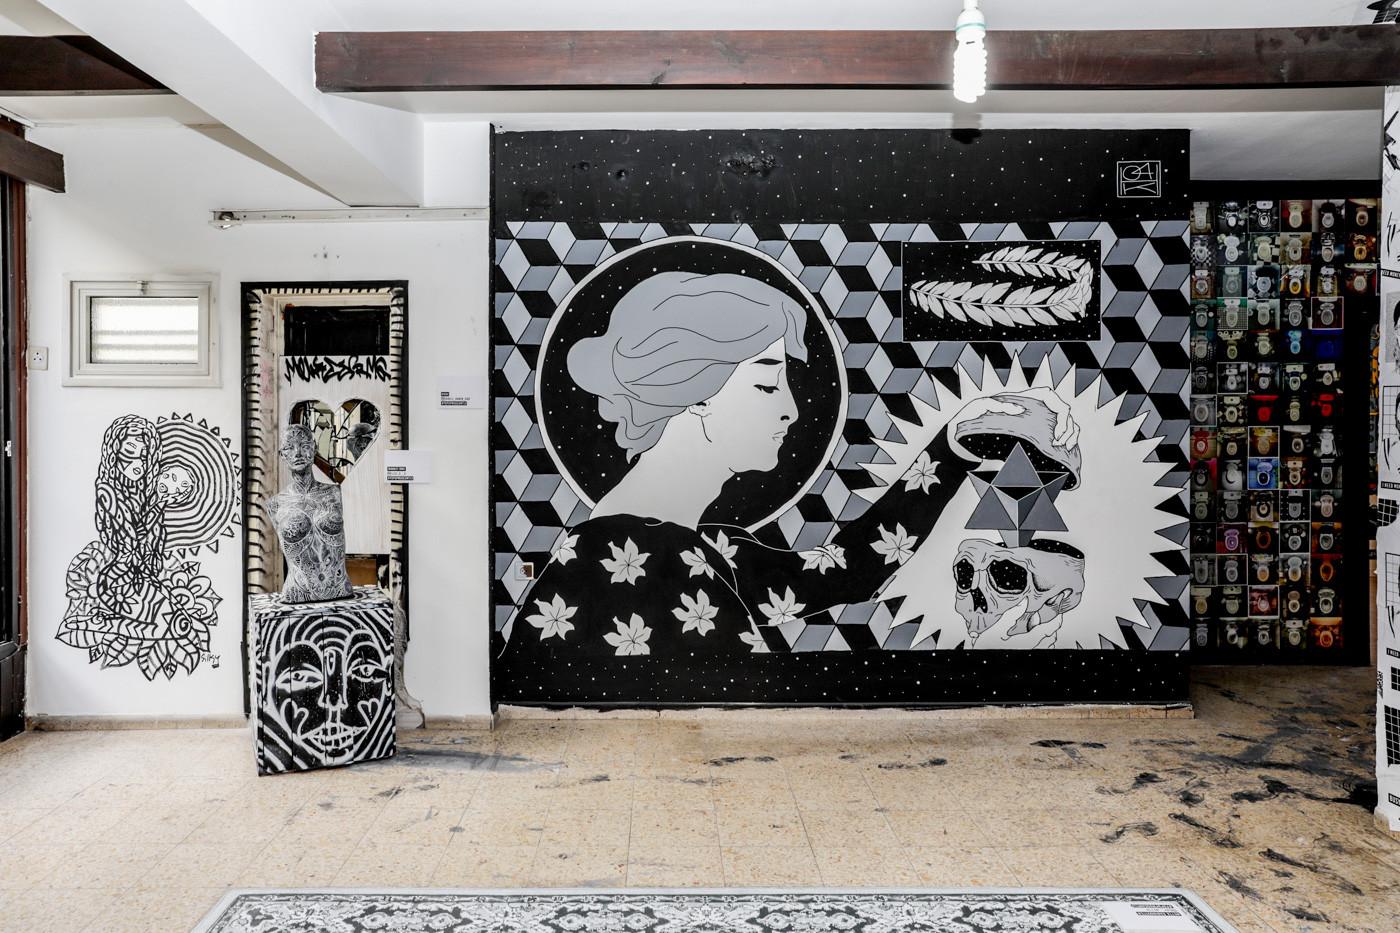 Kirill Hanin - KH04 + MONKEY RMG